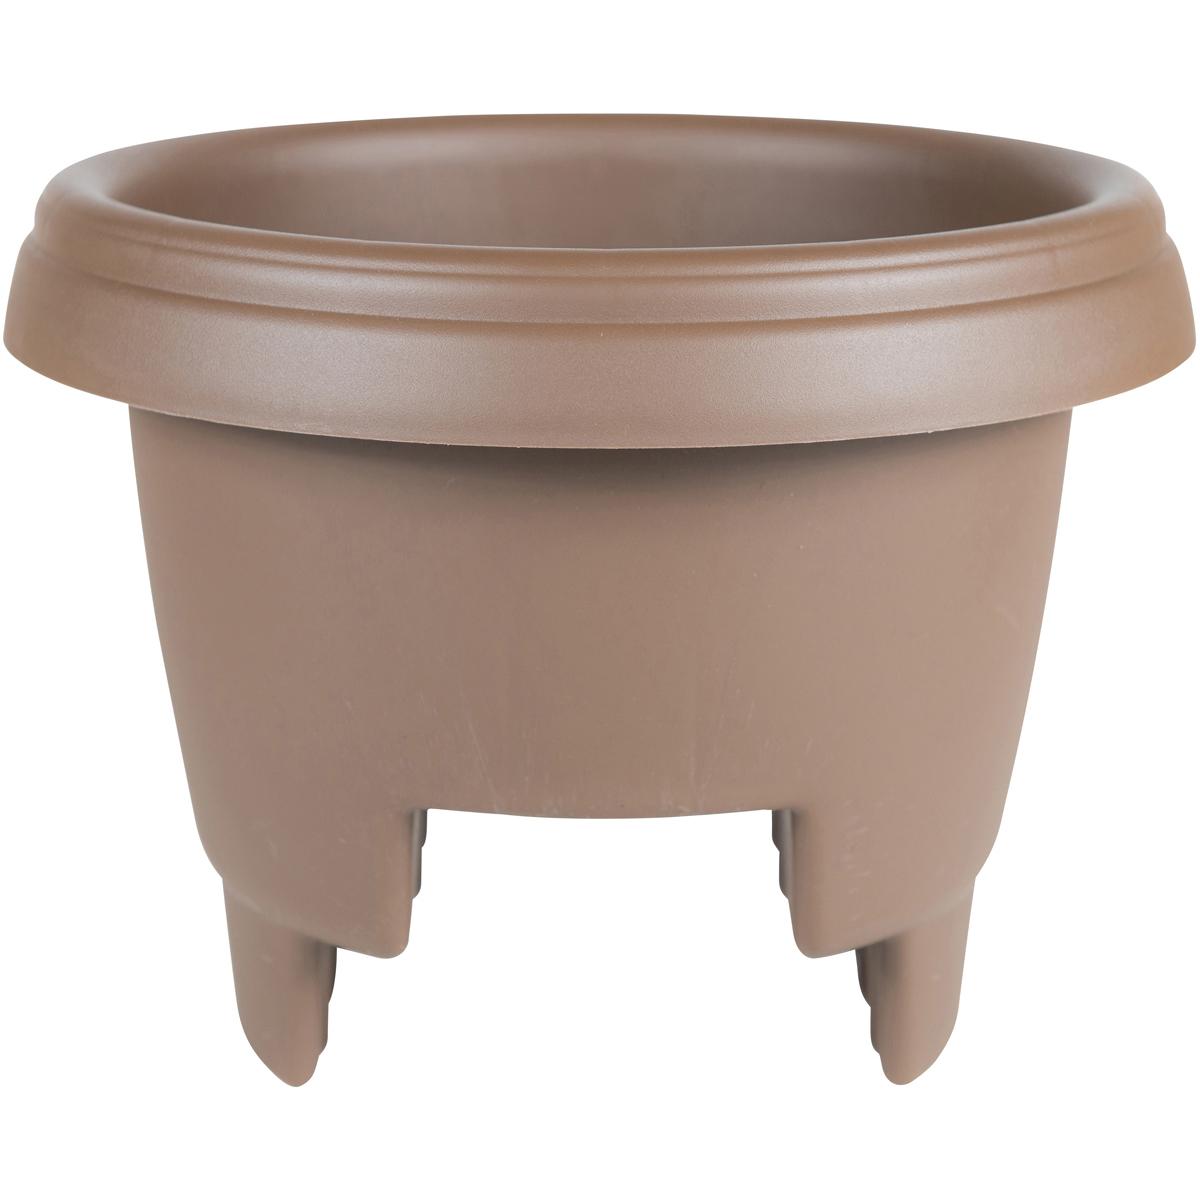 "Bloem Round Deck Rail Planter 12""-Chocolate"